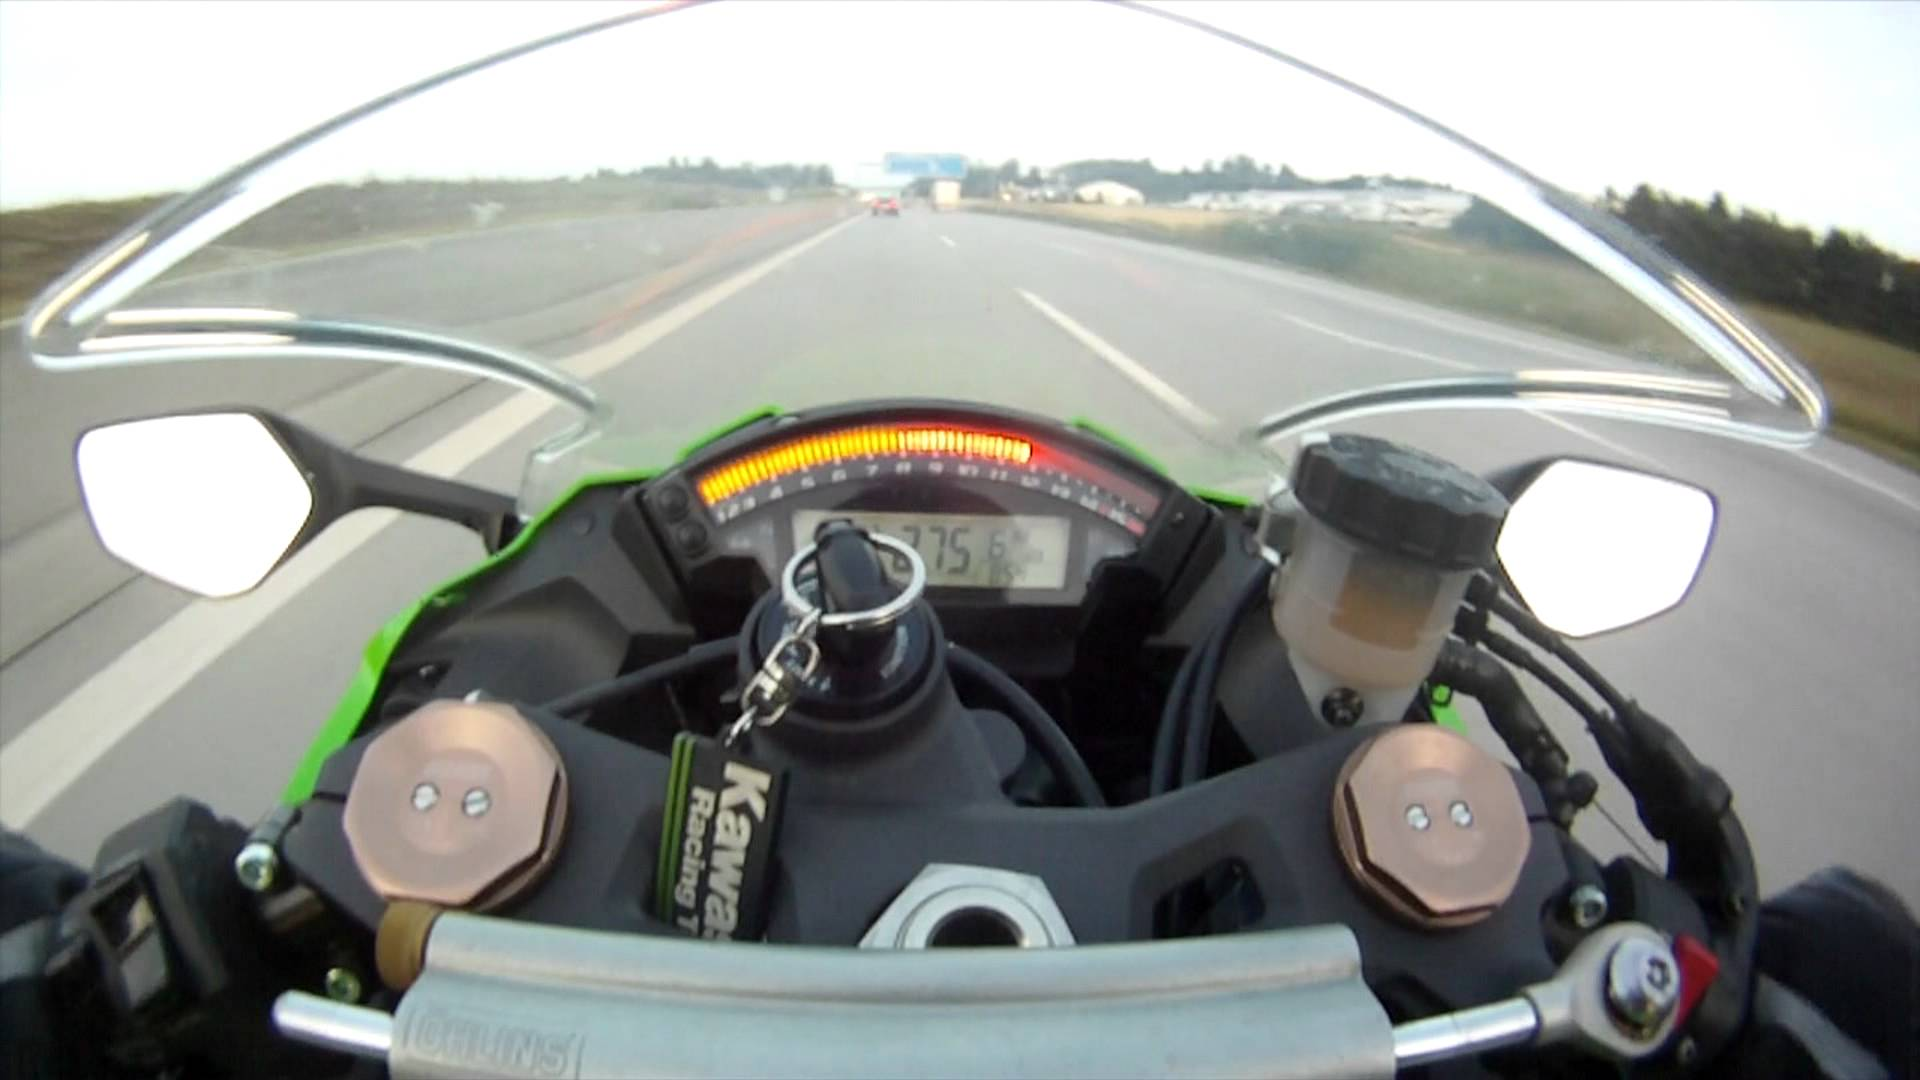 Kawasaki ZX-10R Audi RS6 ABT